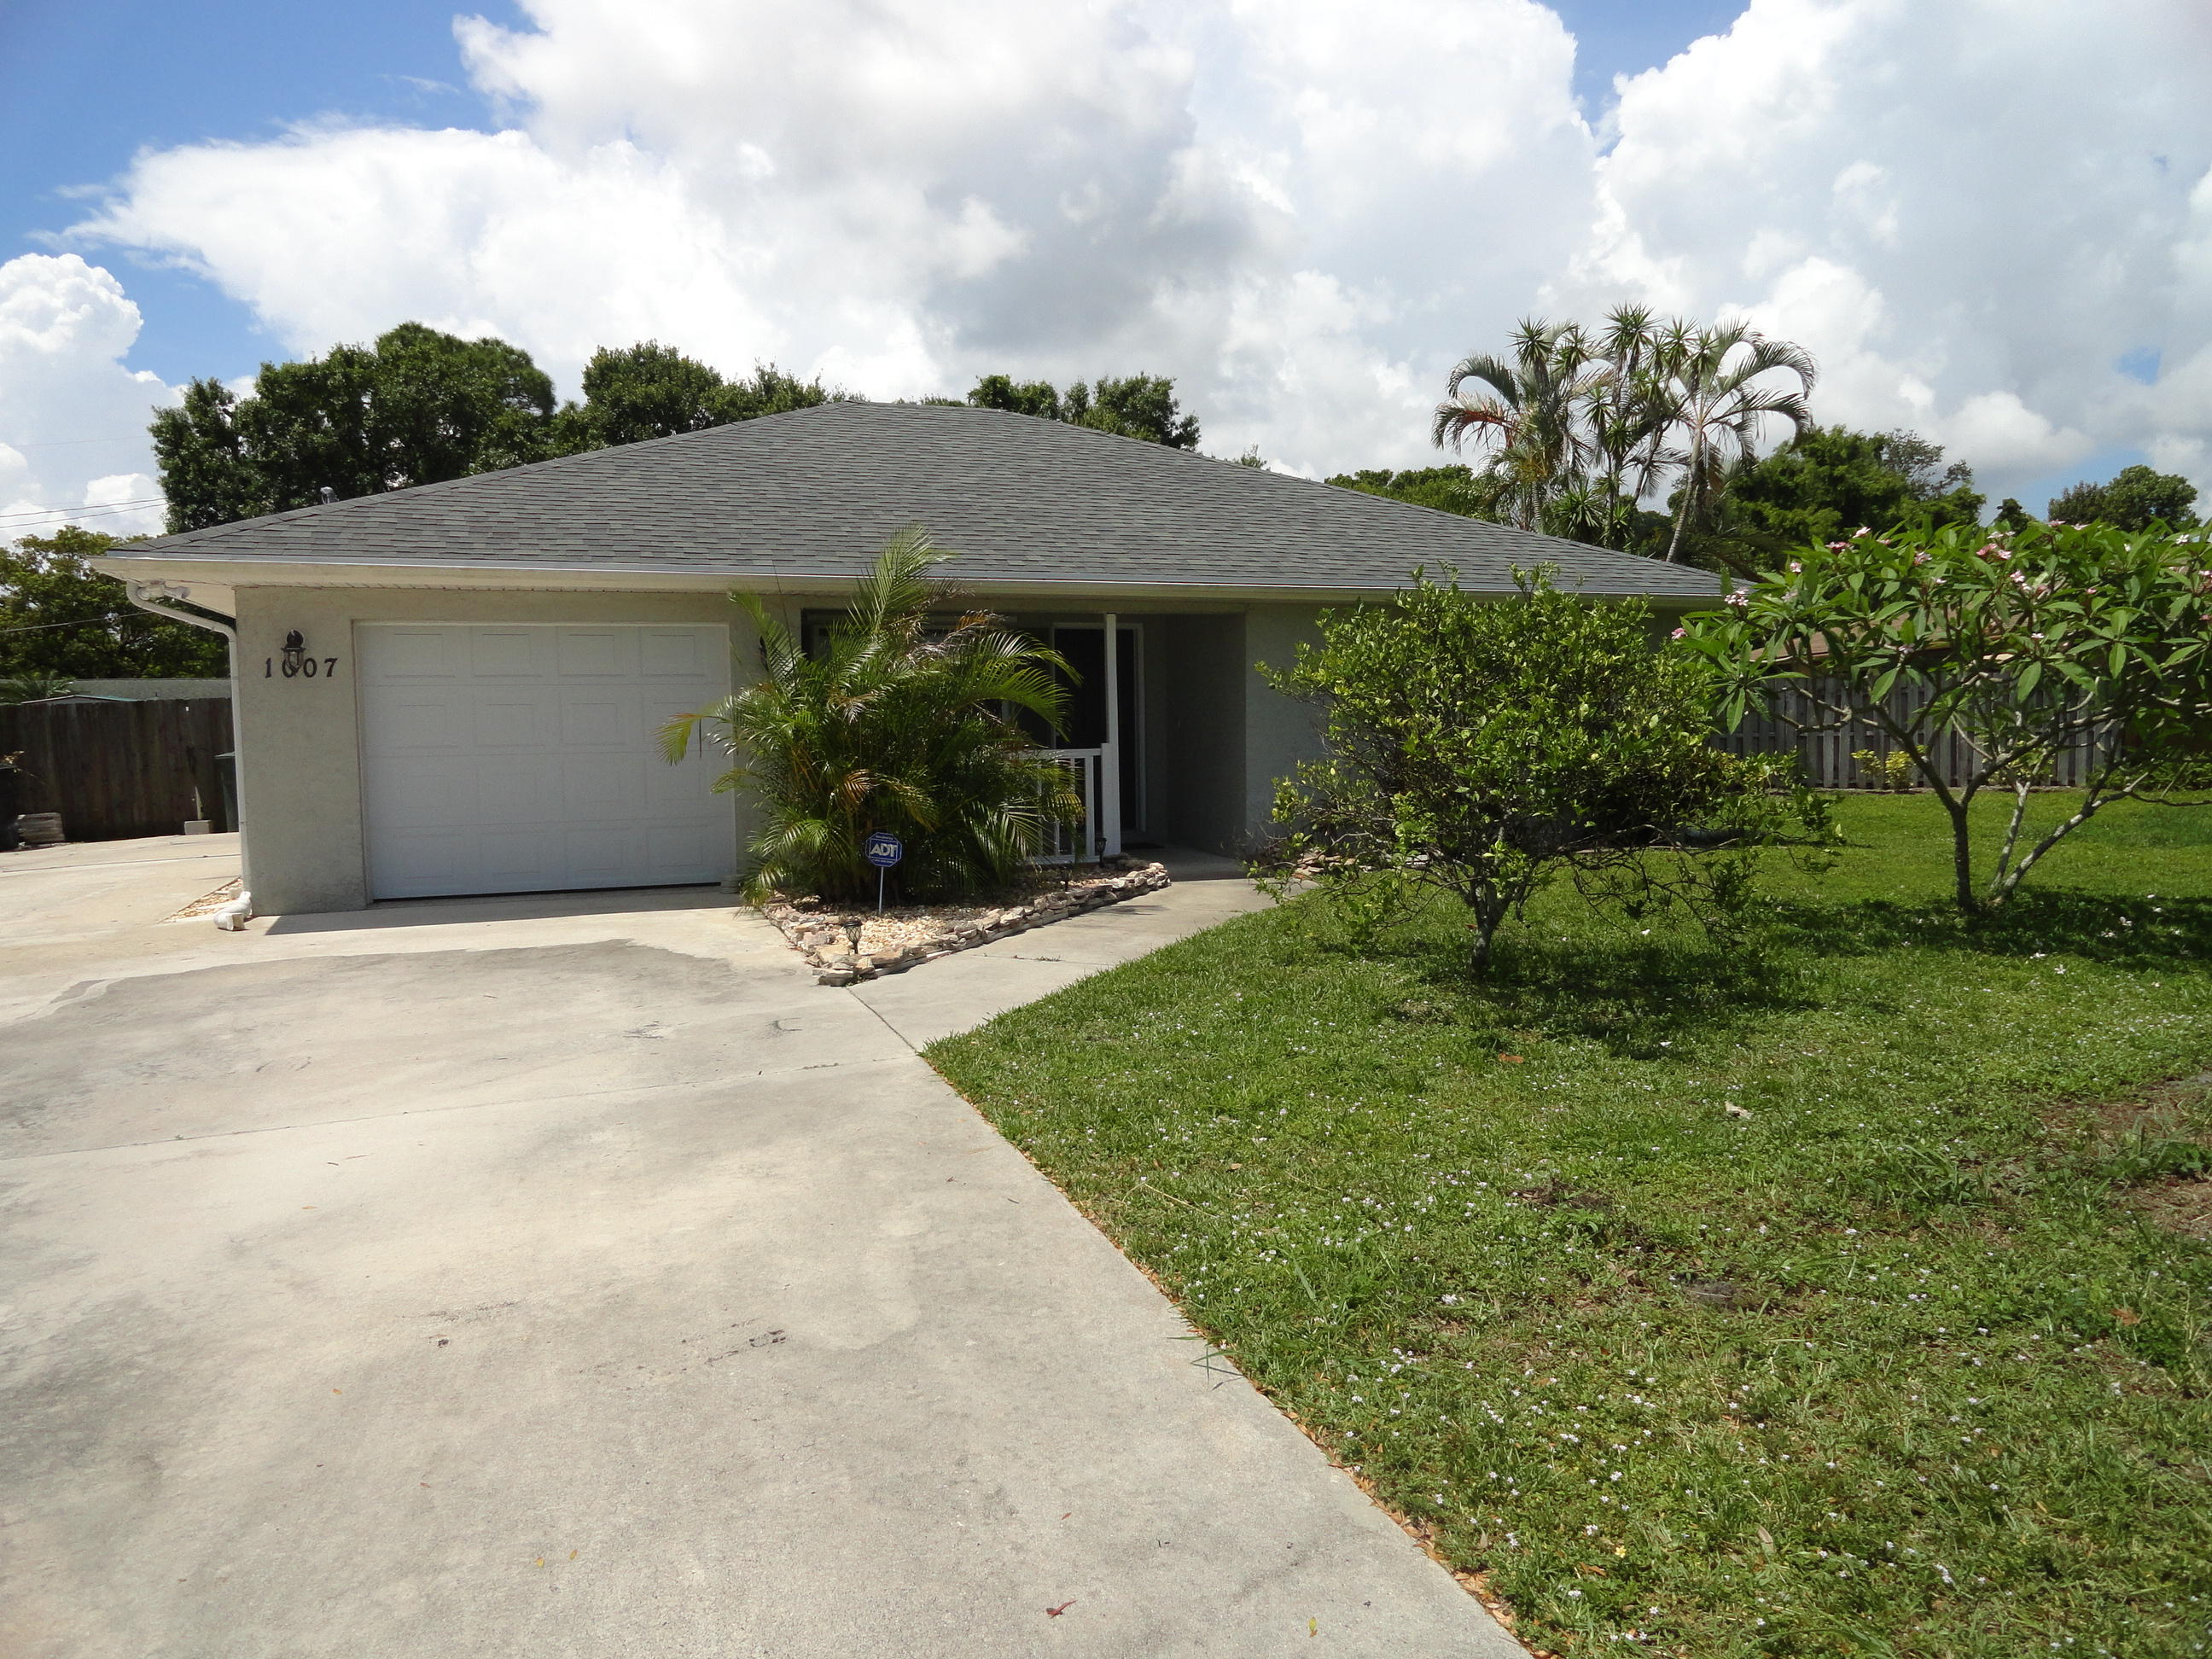 1007 Barbados Avenue, Fort Pierce, FL 34982